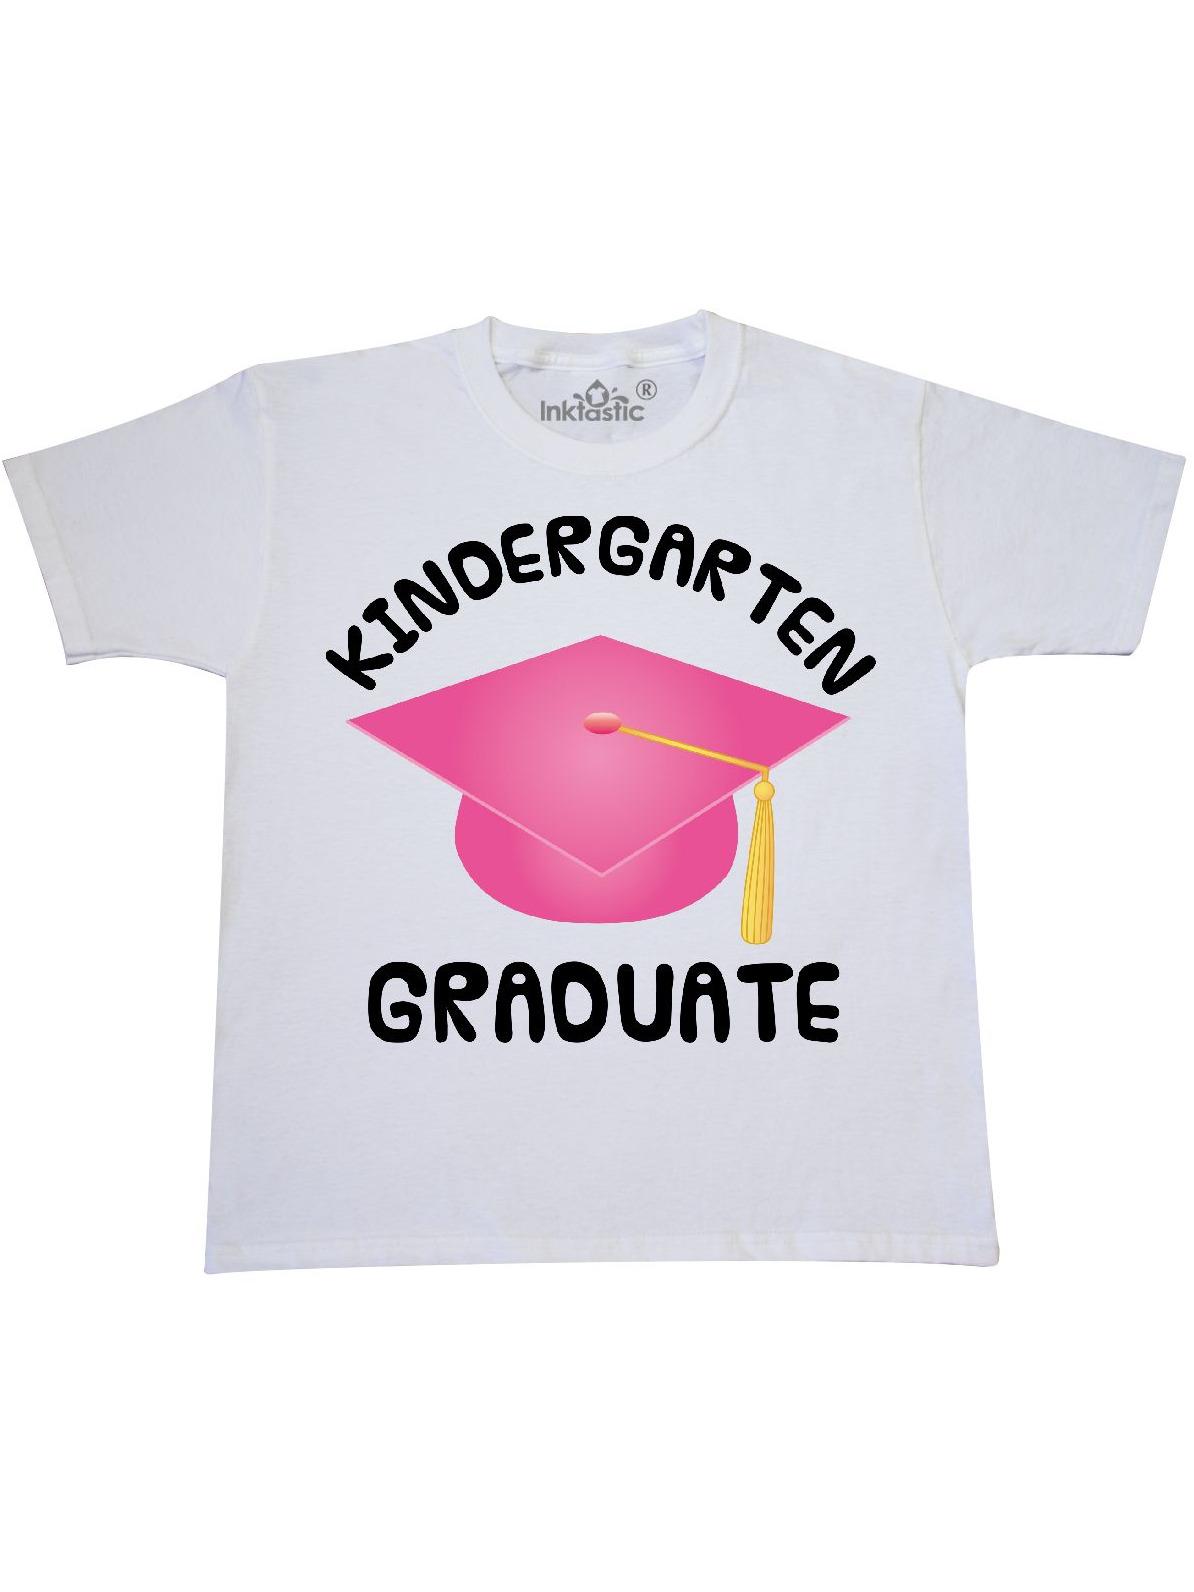 Kindergarten Graduation Day girls Youth T-Shirt